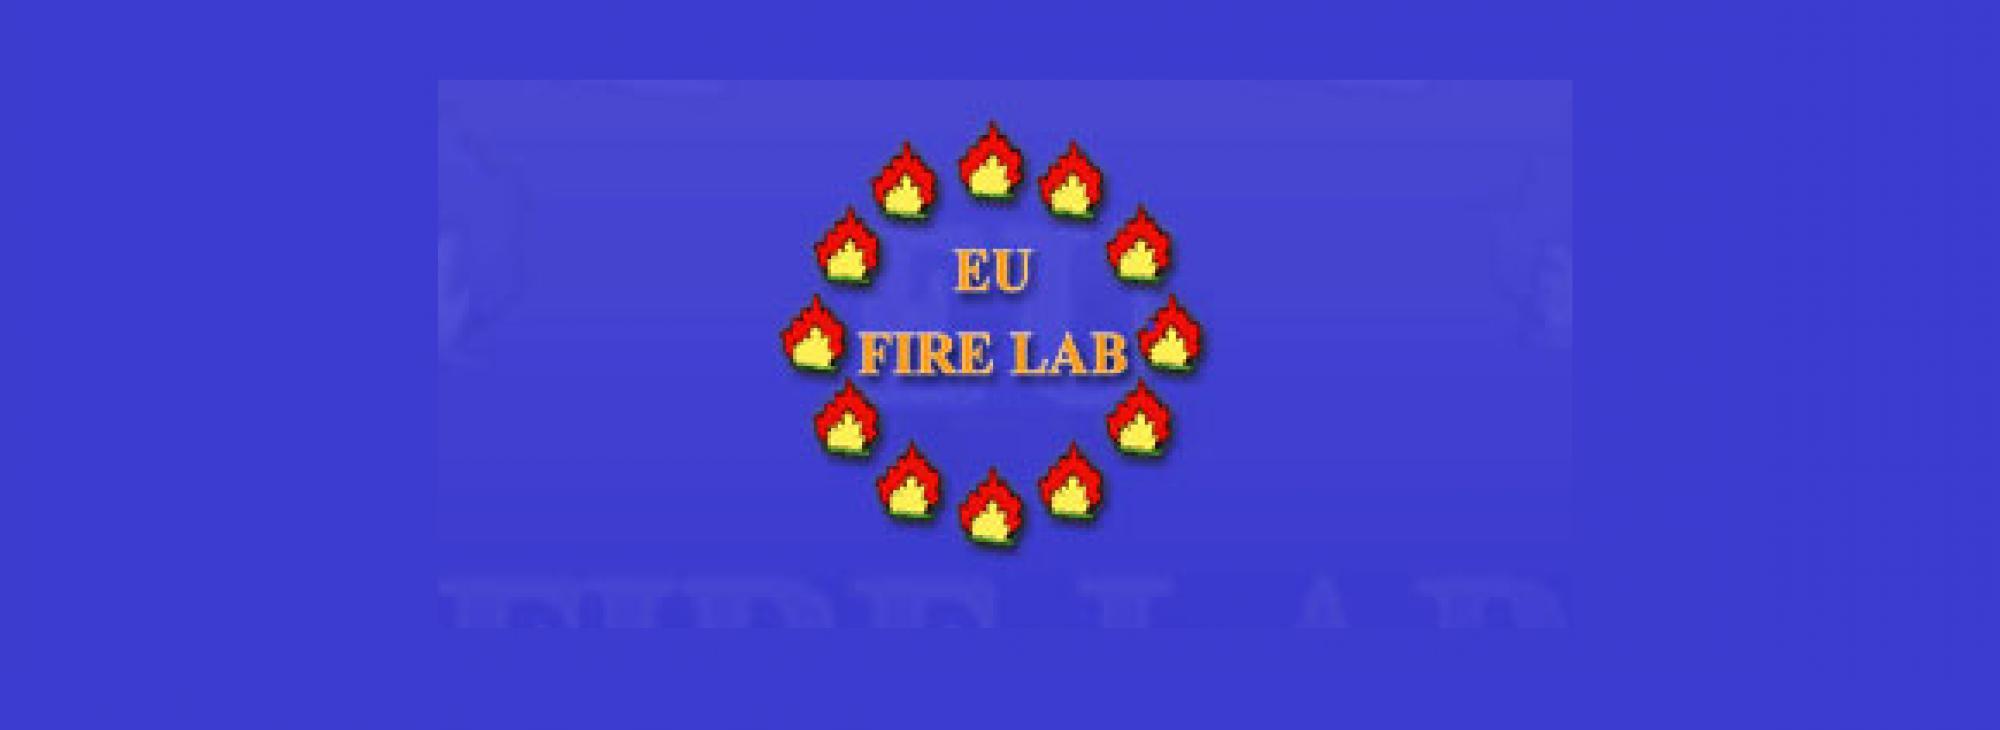 eufirelab